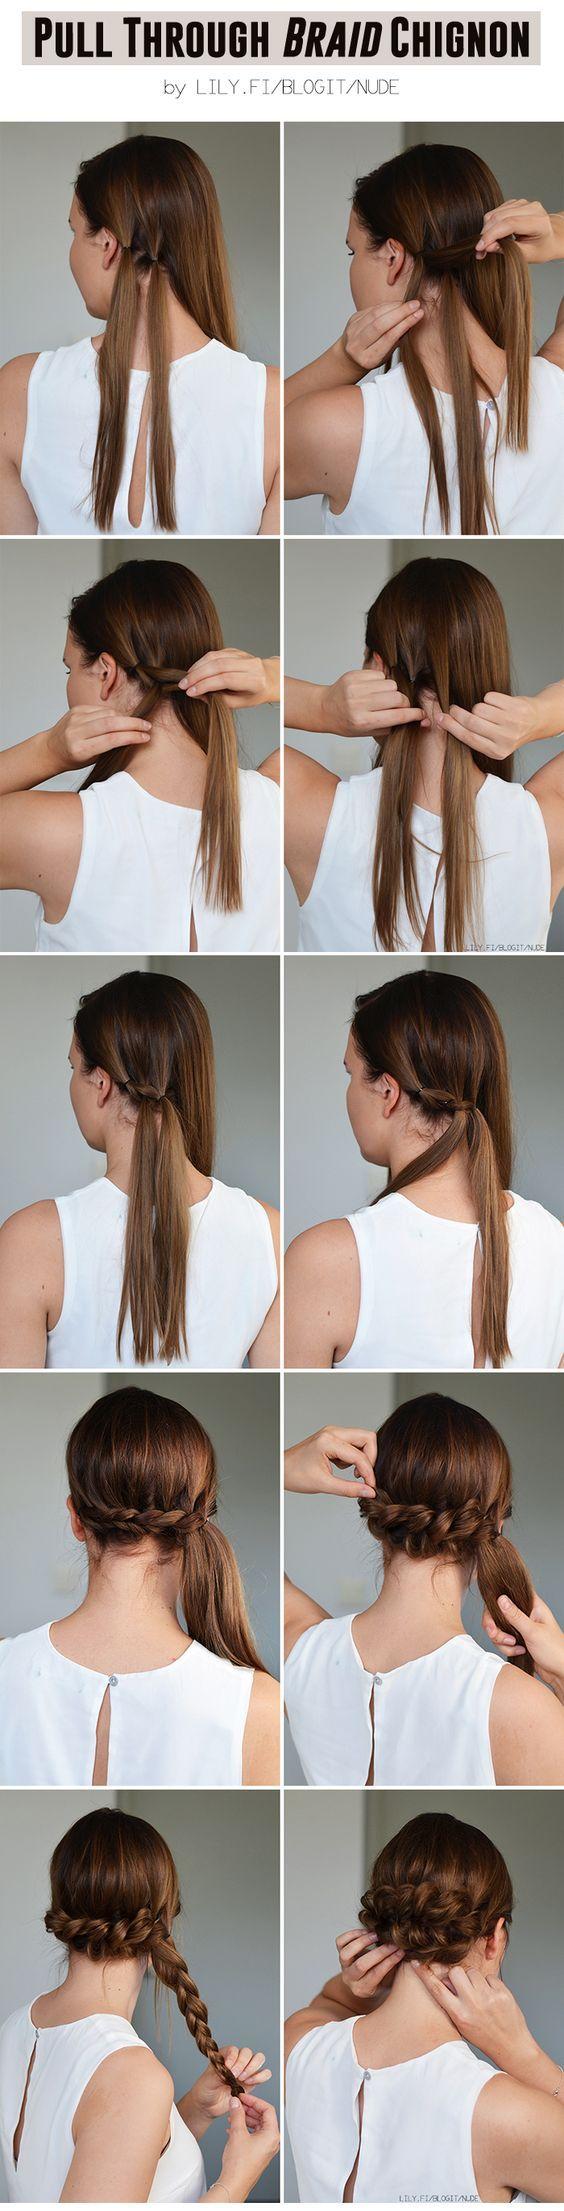 ideas para bollos originales de niña cheveux pinterest